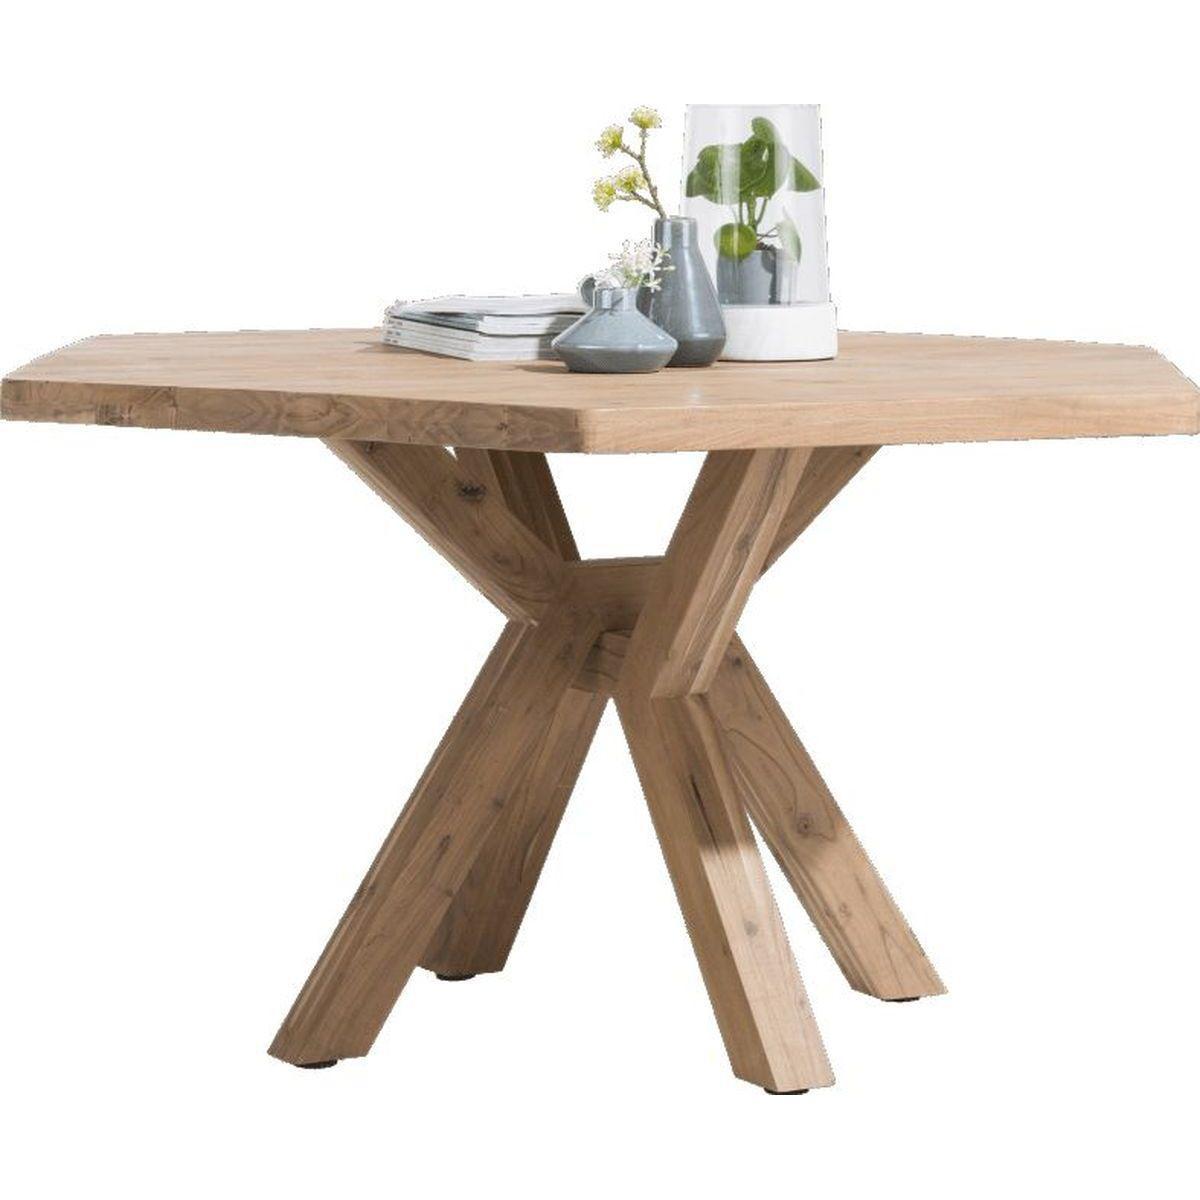 Table QUEBEC Henders & Hazel 150x130cm pieds en bois